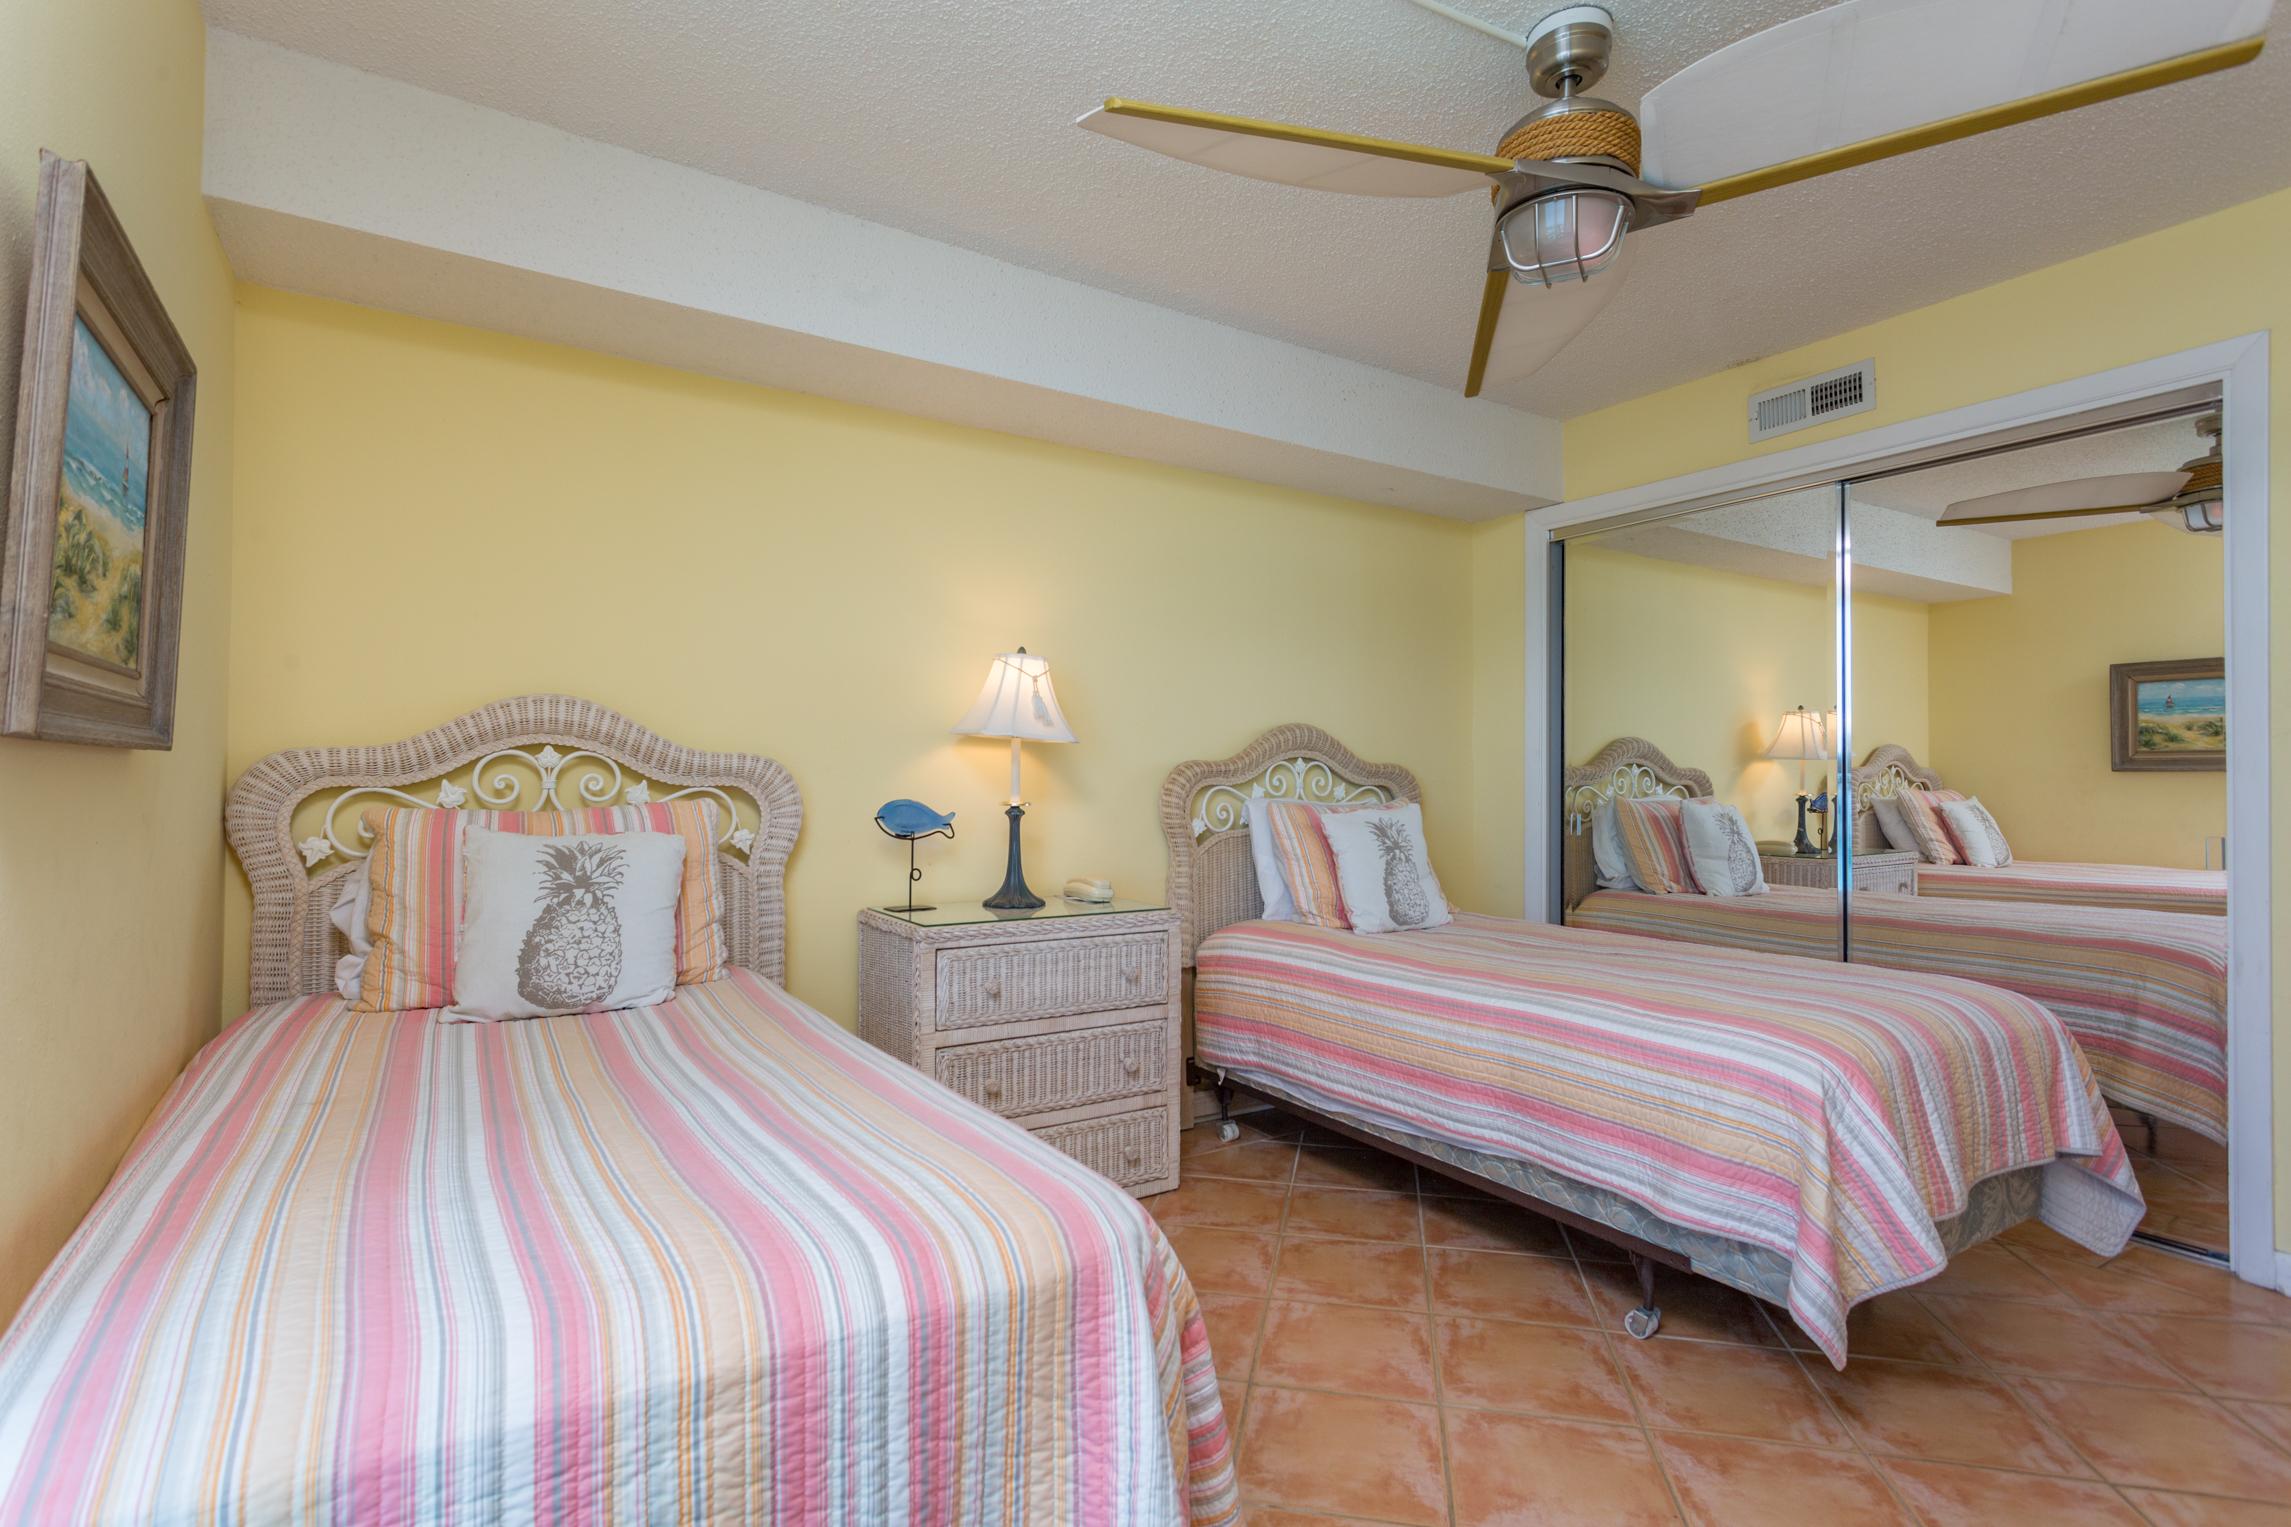 Sabine Yacht & Racquet Club #9D Condo rental in Sabine Yacht & Racquet Club ~ Pensacola Beach Condo Rentals by BeachGuide in Pensacola Beach Florida - #15